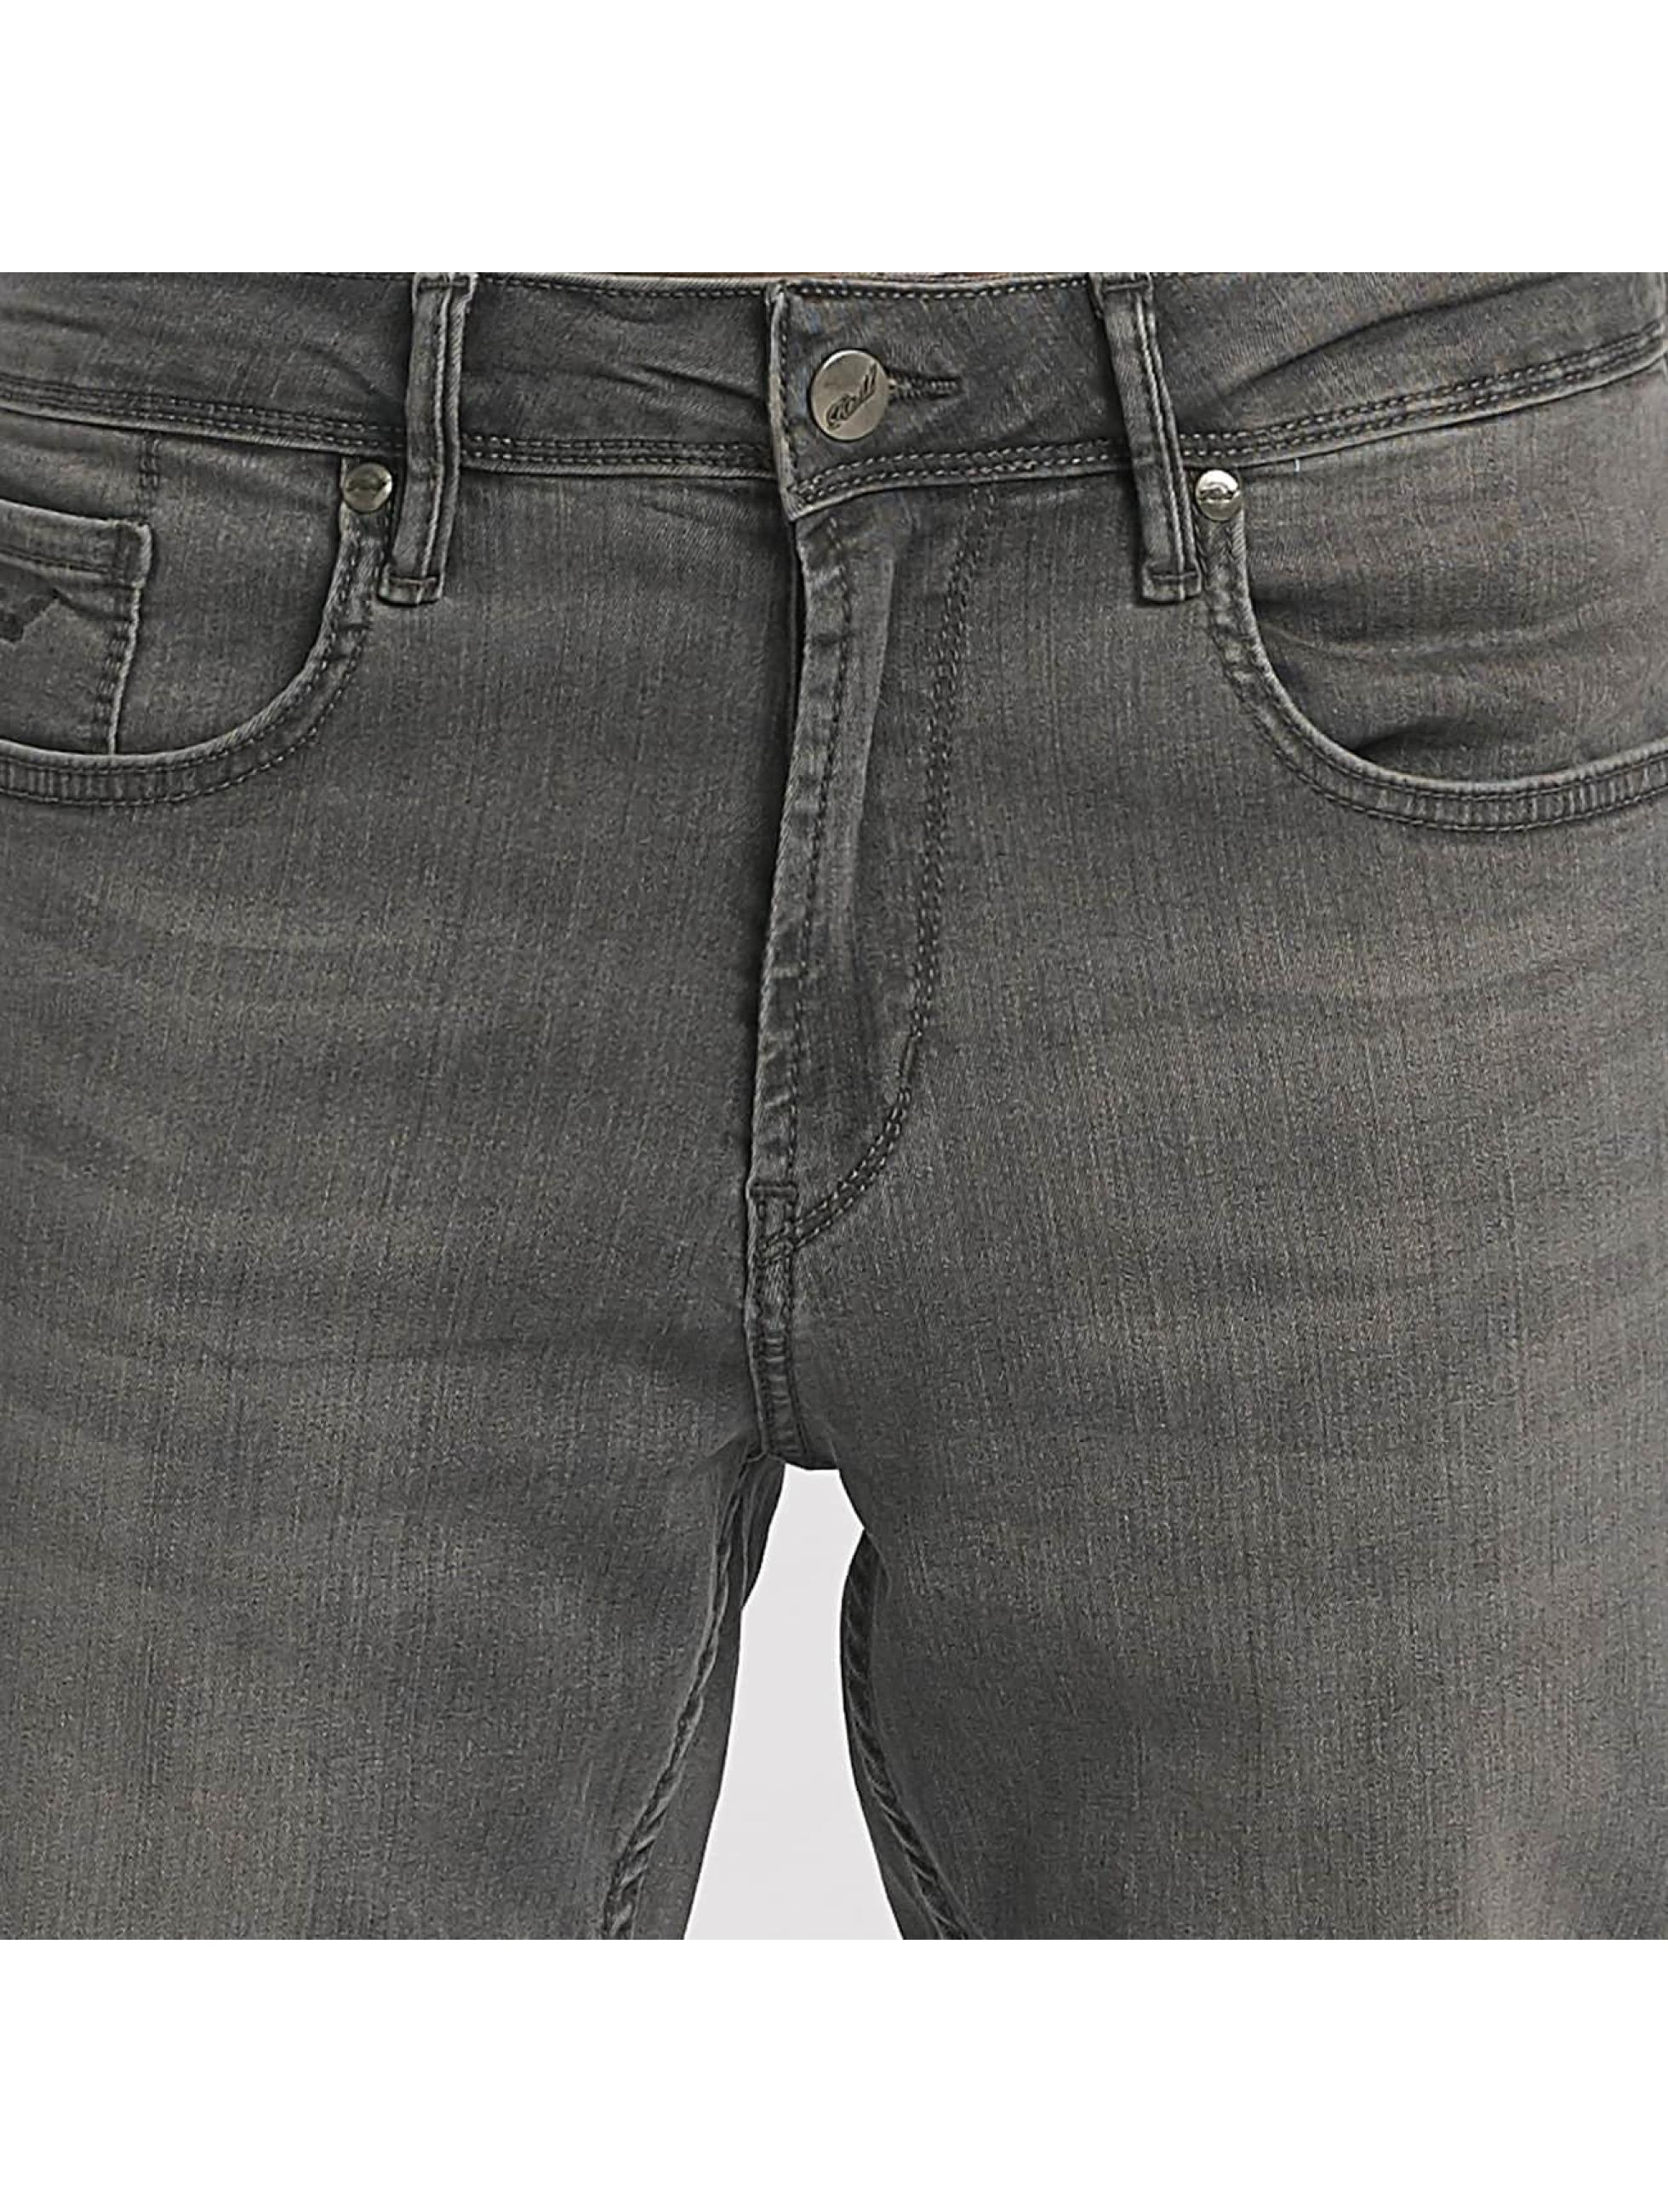 Reell Jeans Straight Fit farkut Trigger 2 harmaa